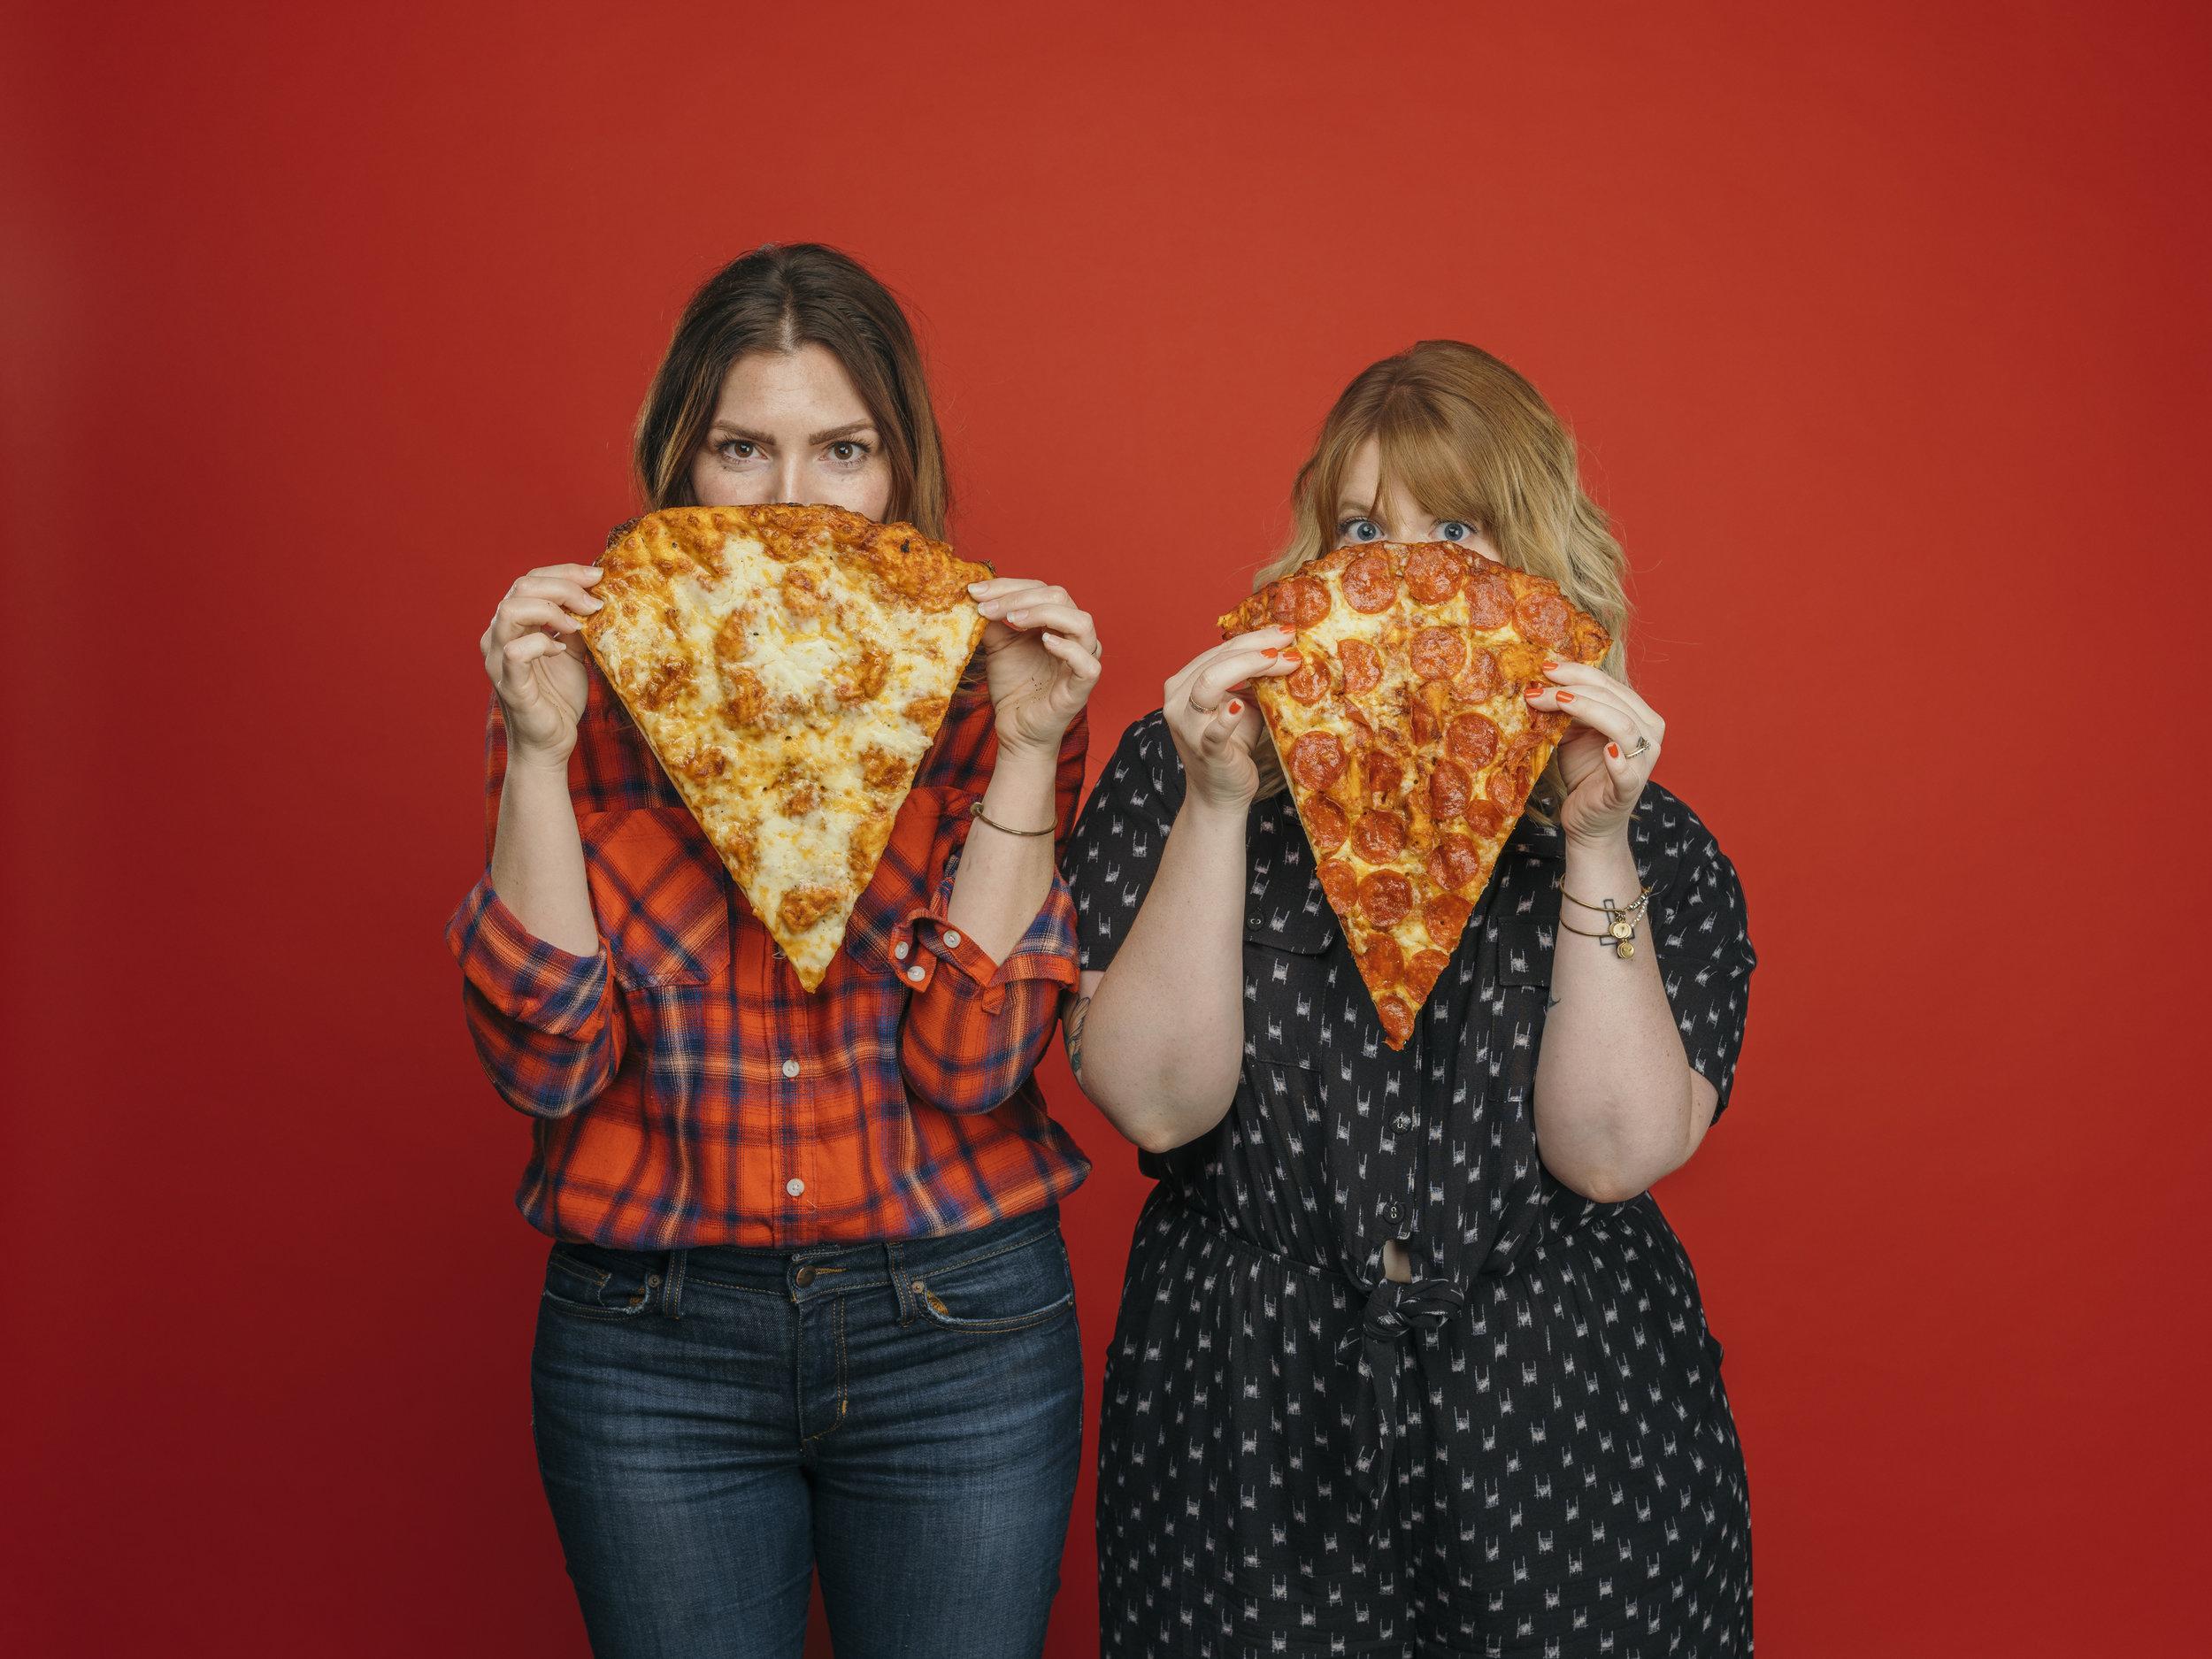 PizzaPortraitsResized-13.jpg